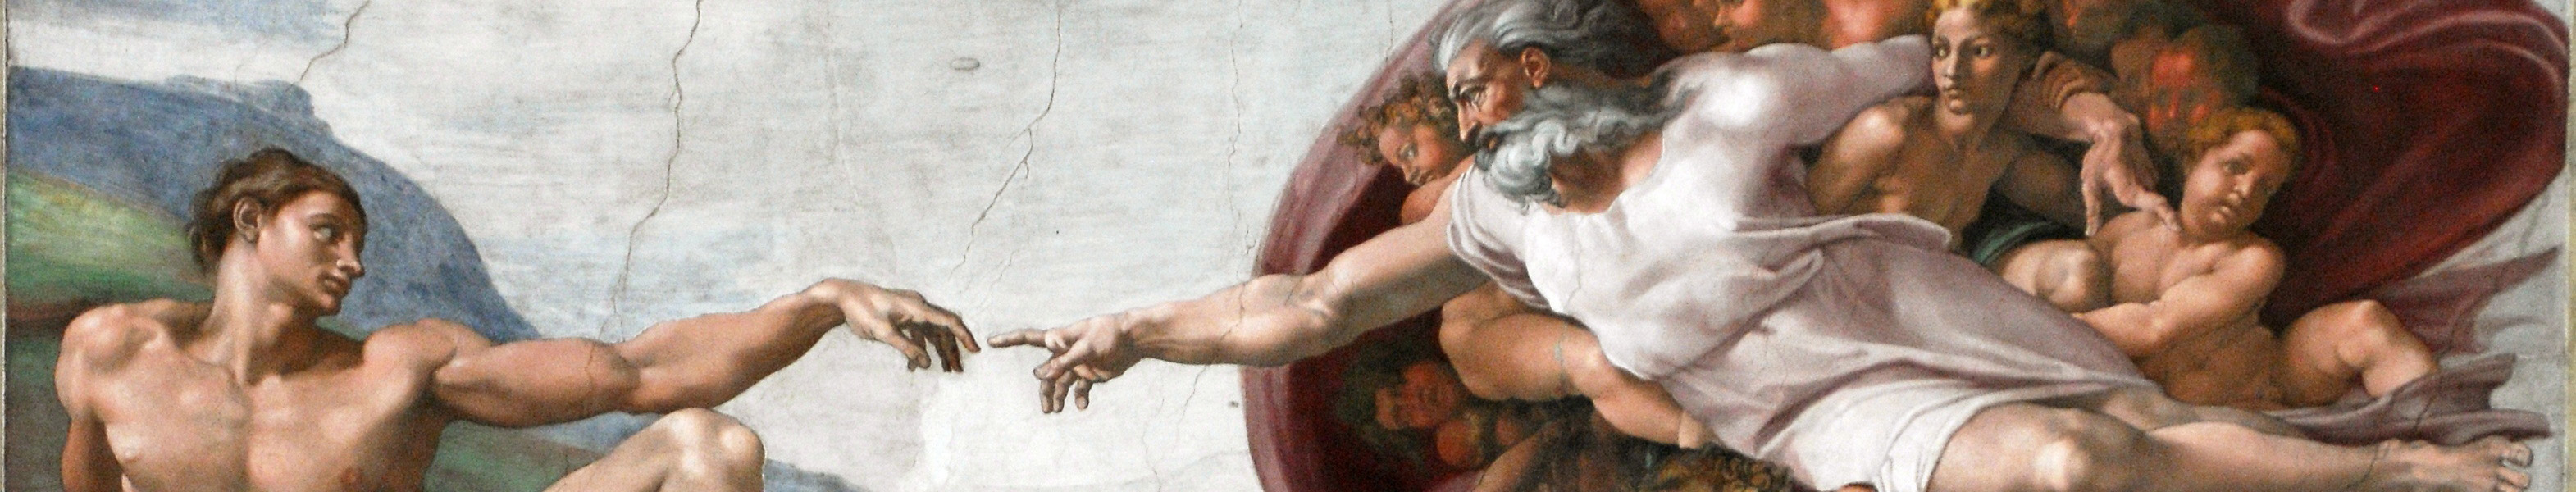 creation of man 1159966 Copia 2